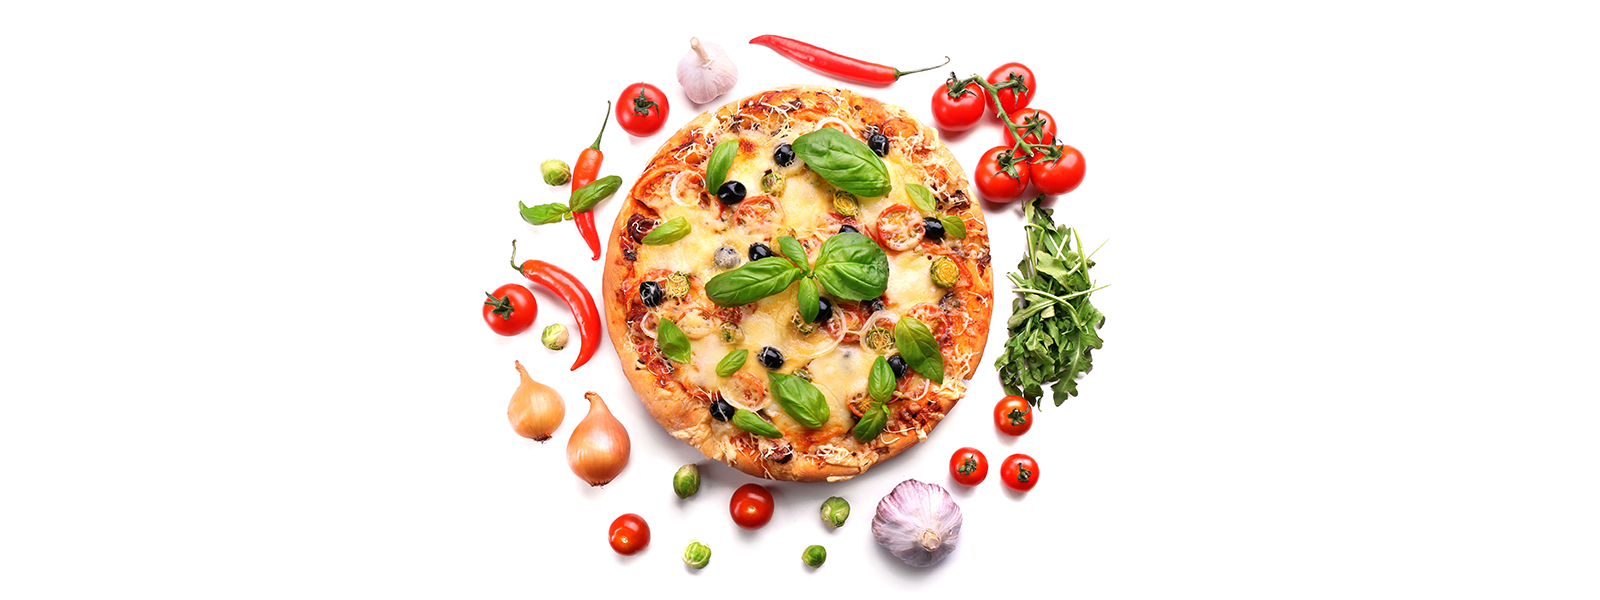 Caspian Pizza Oldbury Caspian Pizza Oldbury Tividale